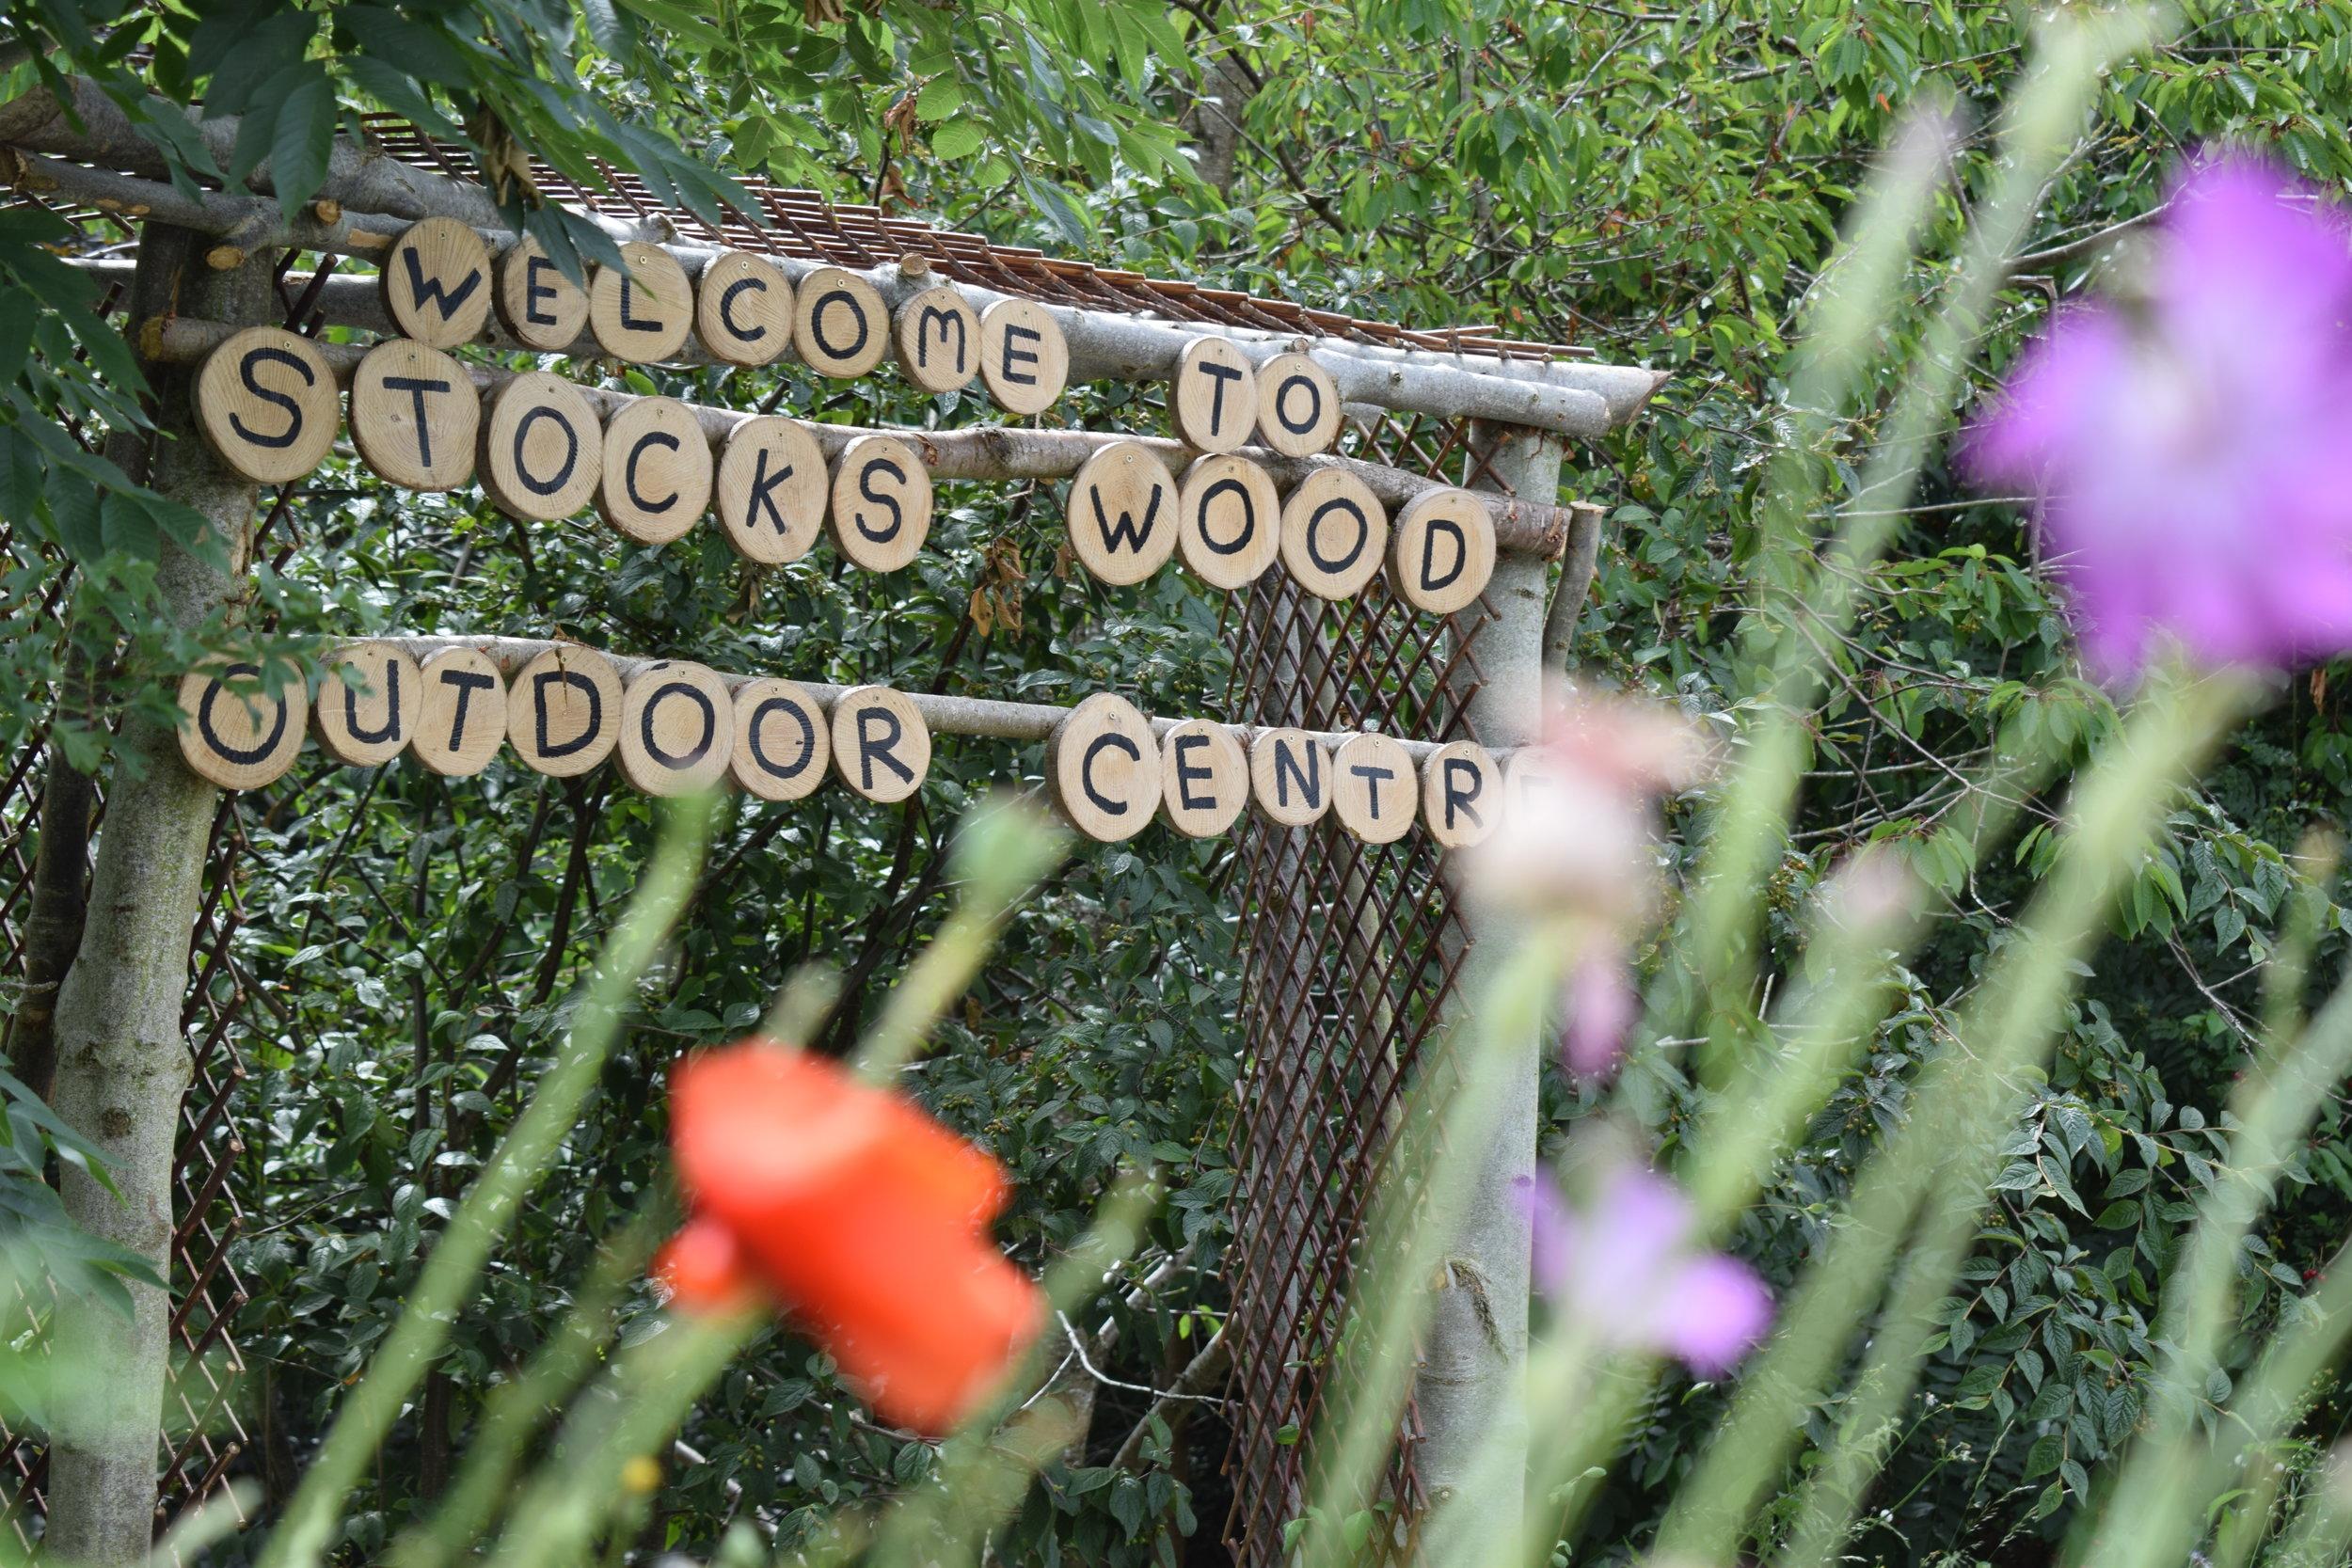 Stocks Wood Outdoor Center